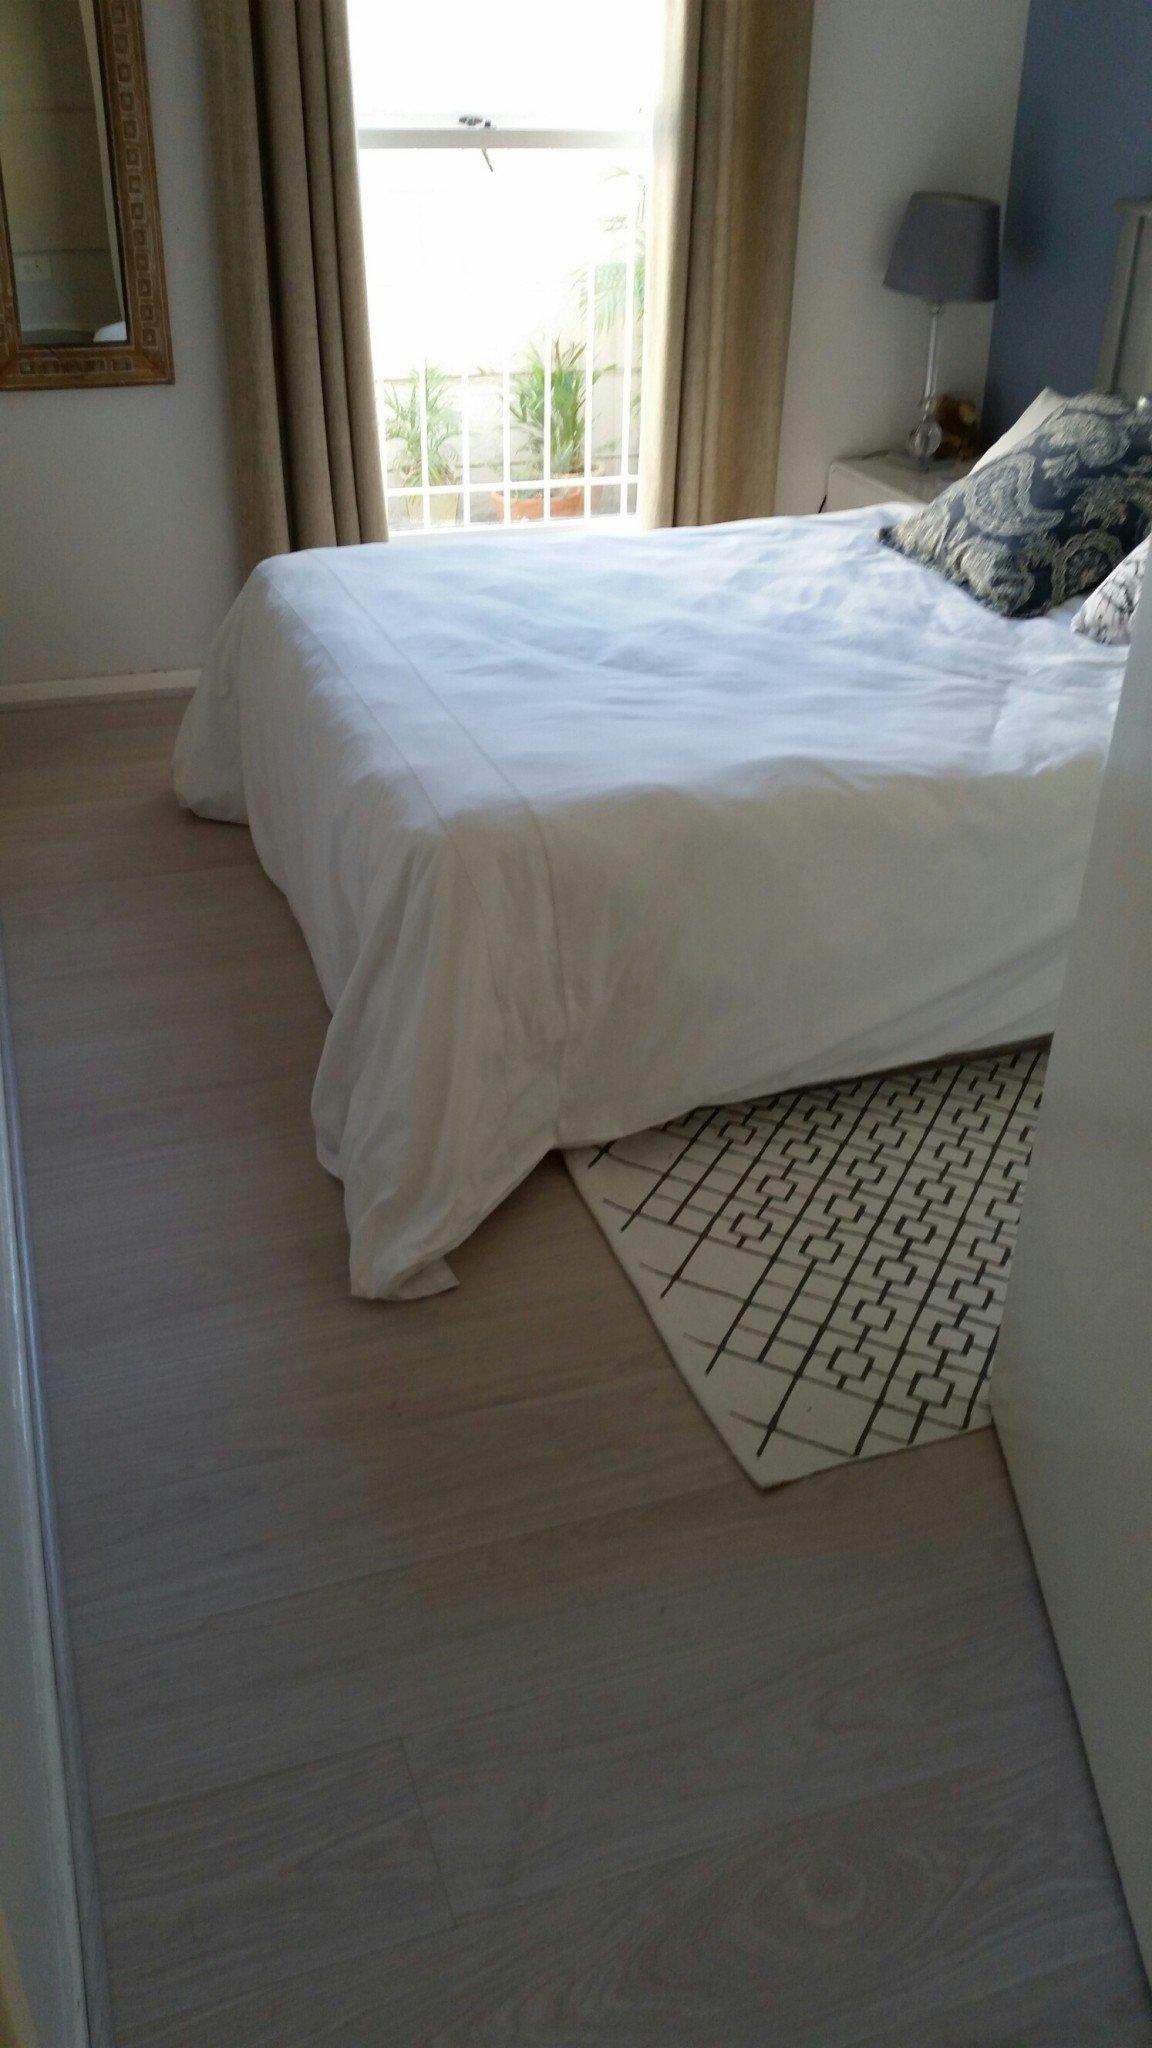 Exquisite Kronotex Waveless Oak White 8mm Laminate Boards. Recent installation in Constantia.